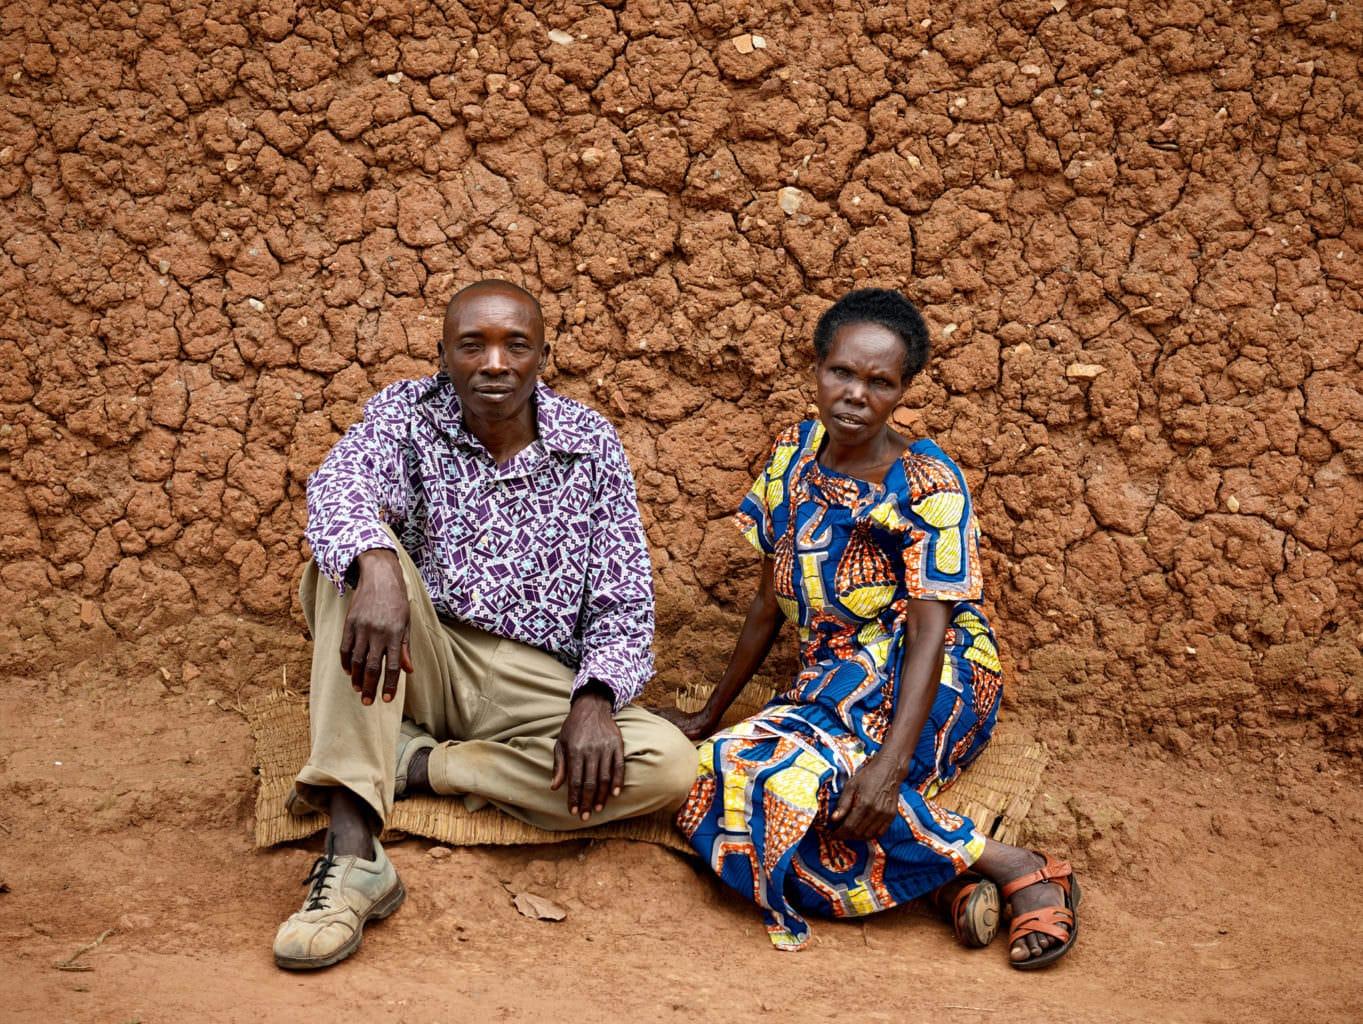 06rwanda_ss-slide-mdsg-superjumbo